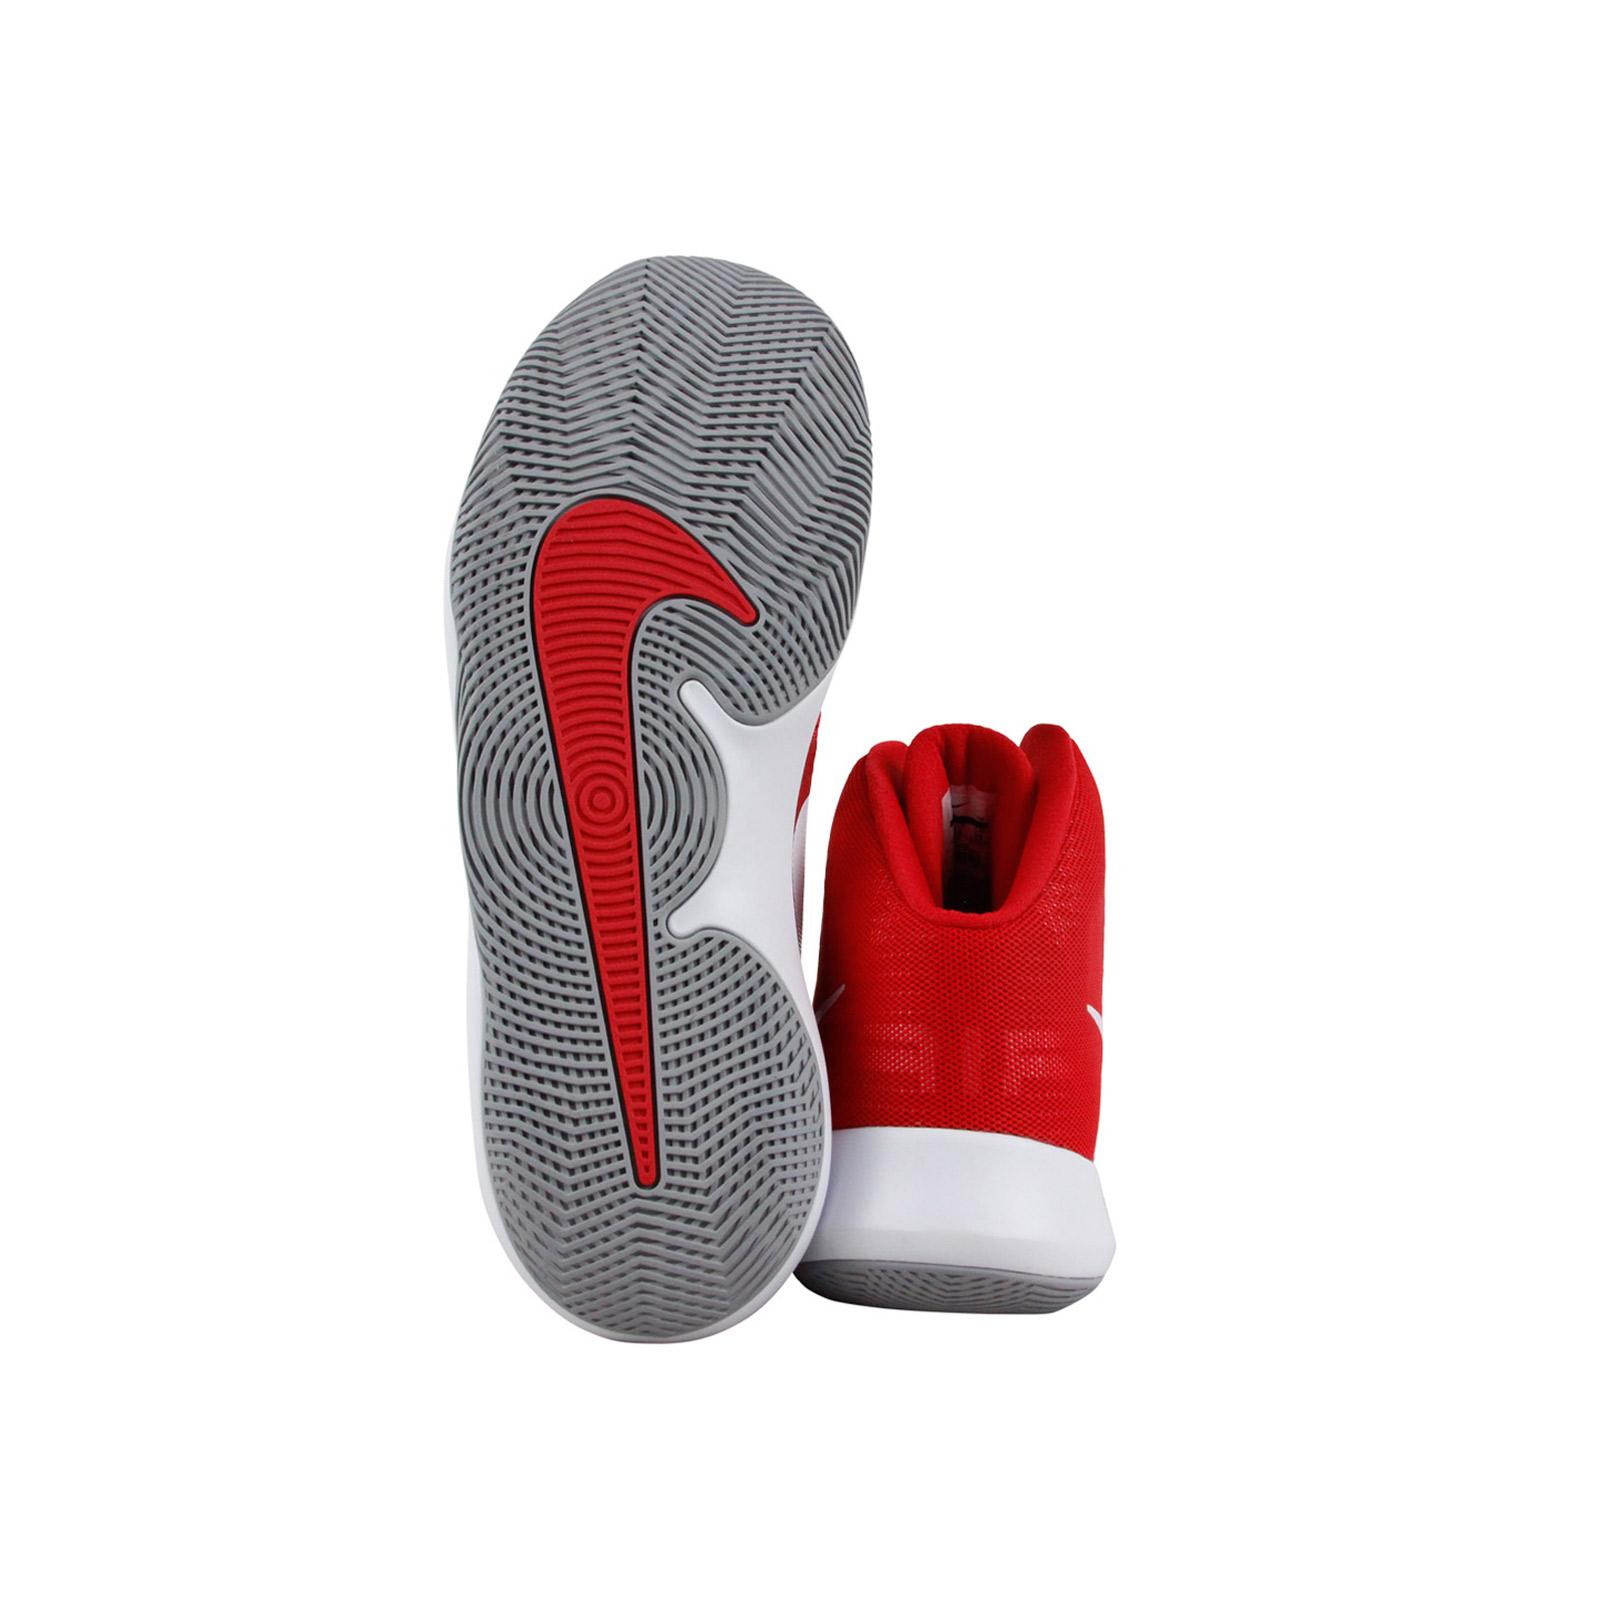 Nike Men's Air Precision University Red / White-Wolf Grey High-Top Basketball Shoe - 11.5M